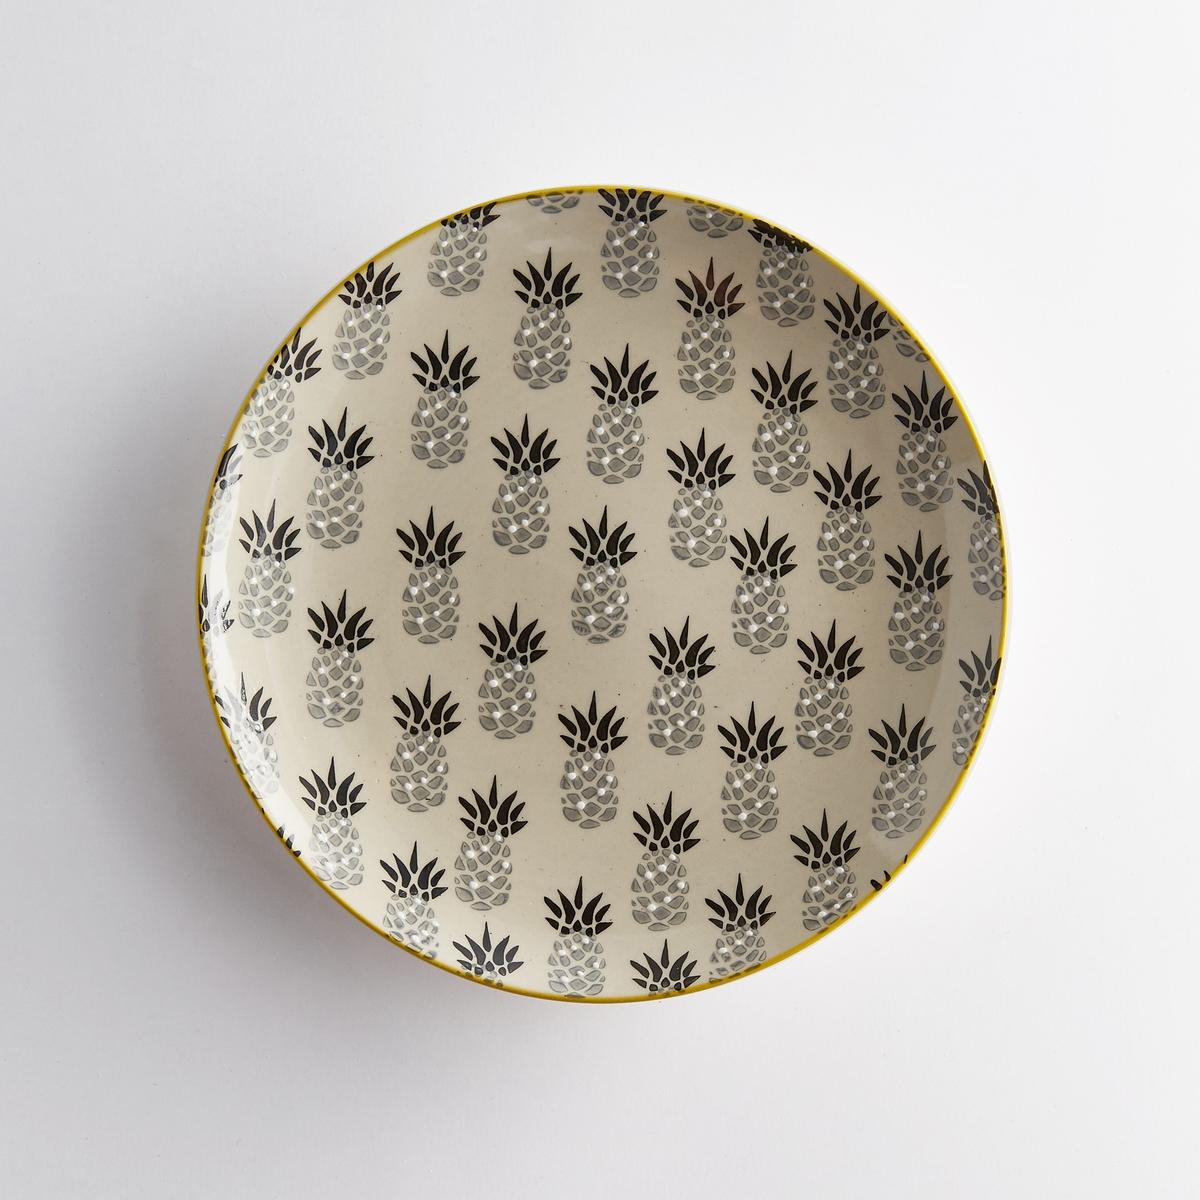 Комплект из 4 десертных тарелок из керамики, Tossita